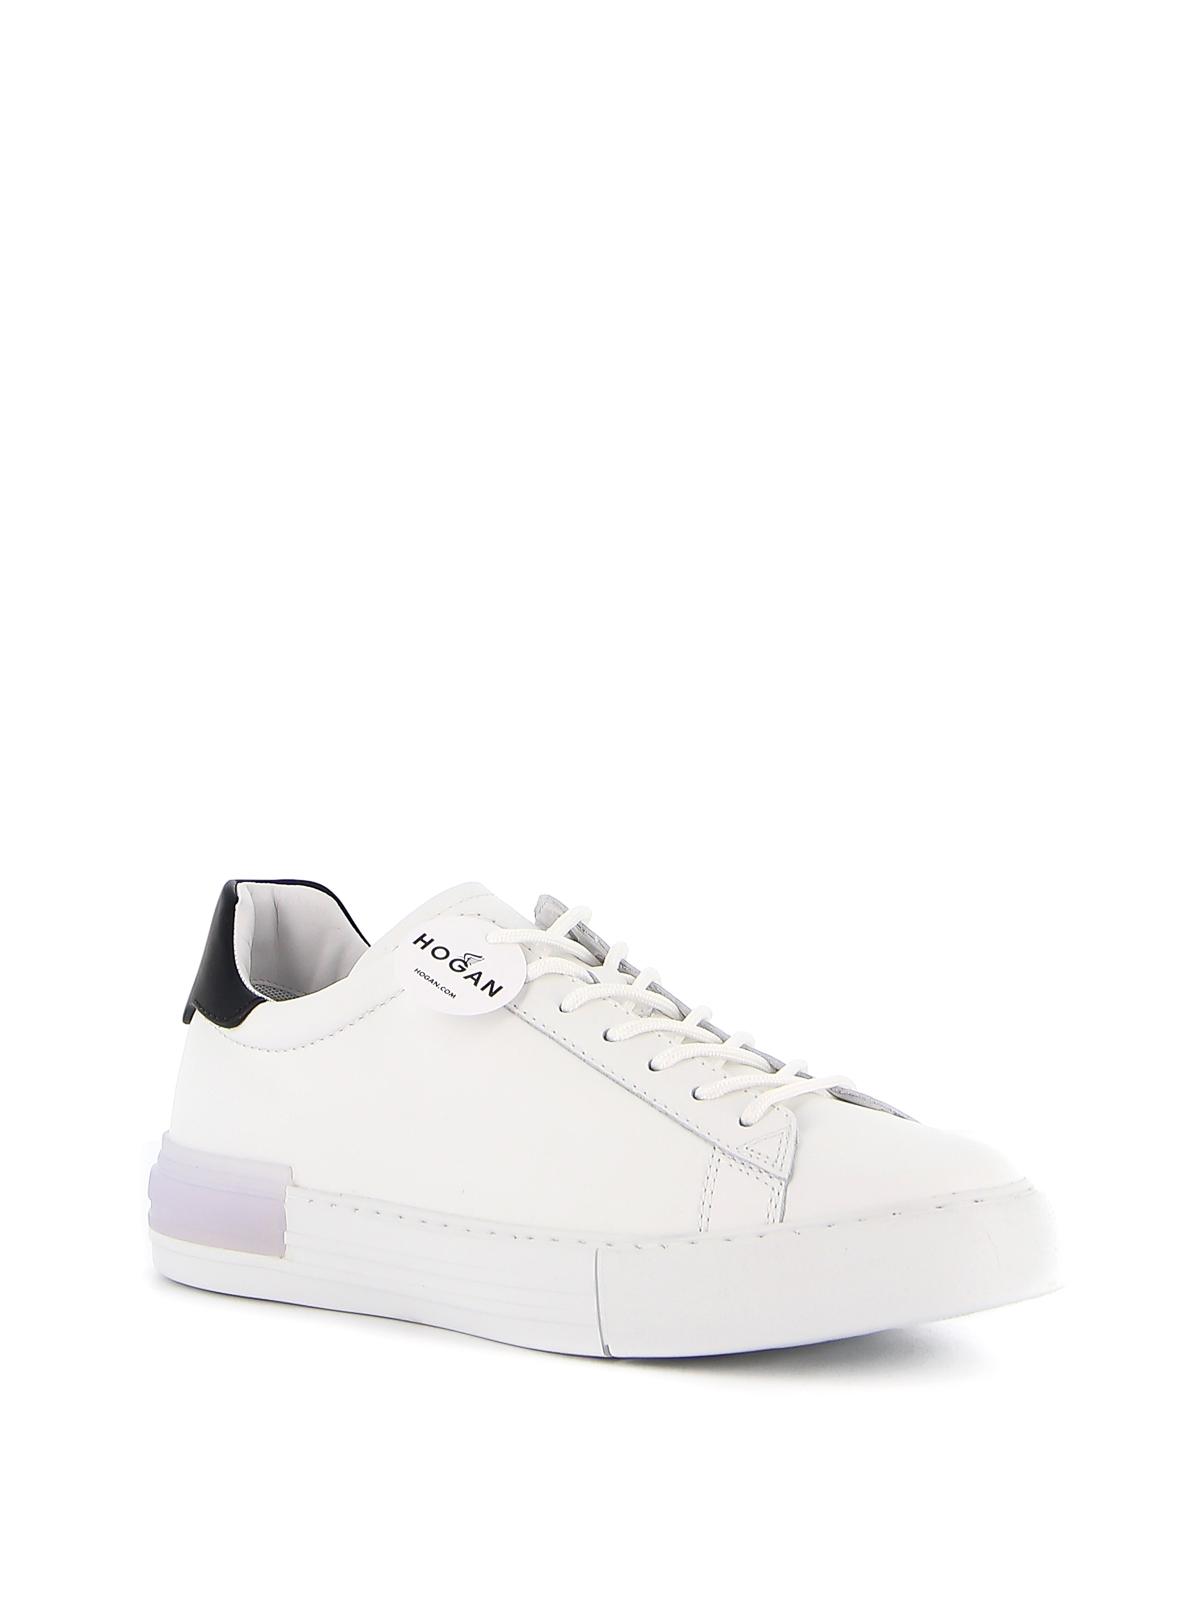 Trainers Hogan - Rebel sneakers - HXM5260CW20KFM0001